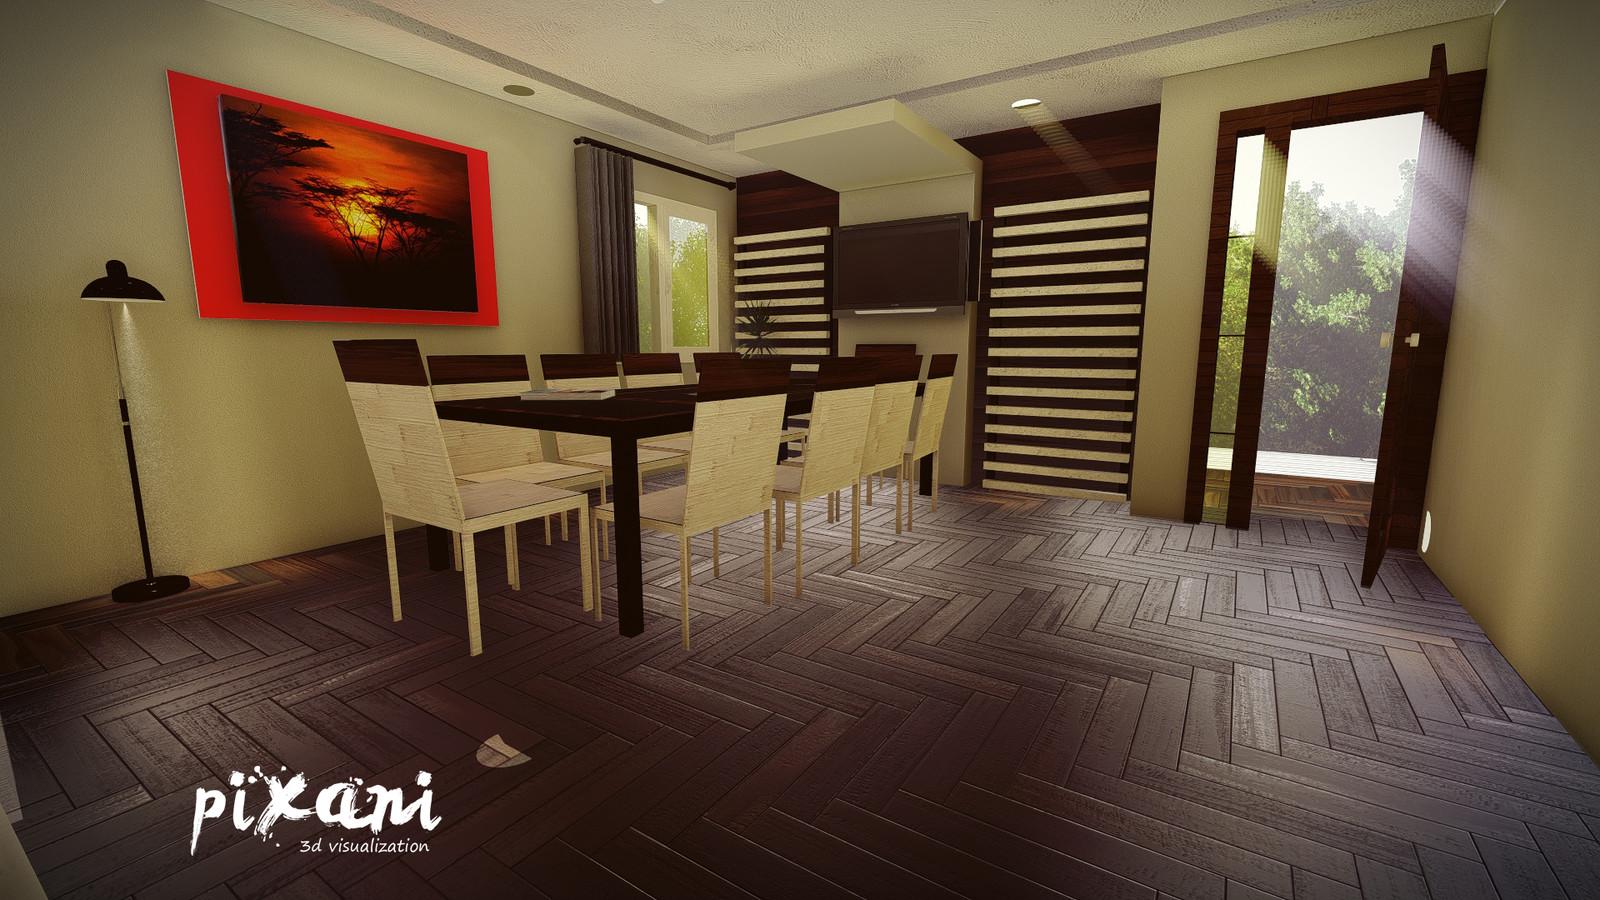 Sariogullari Office Design  #Pixani #pixanirenders #pixanipictures